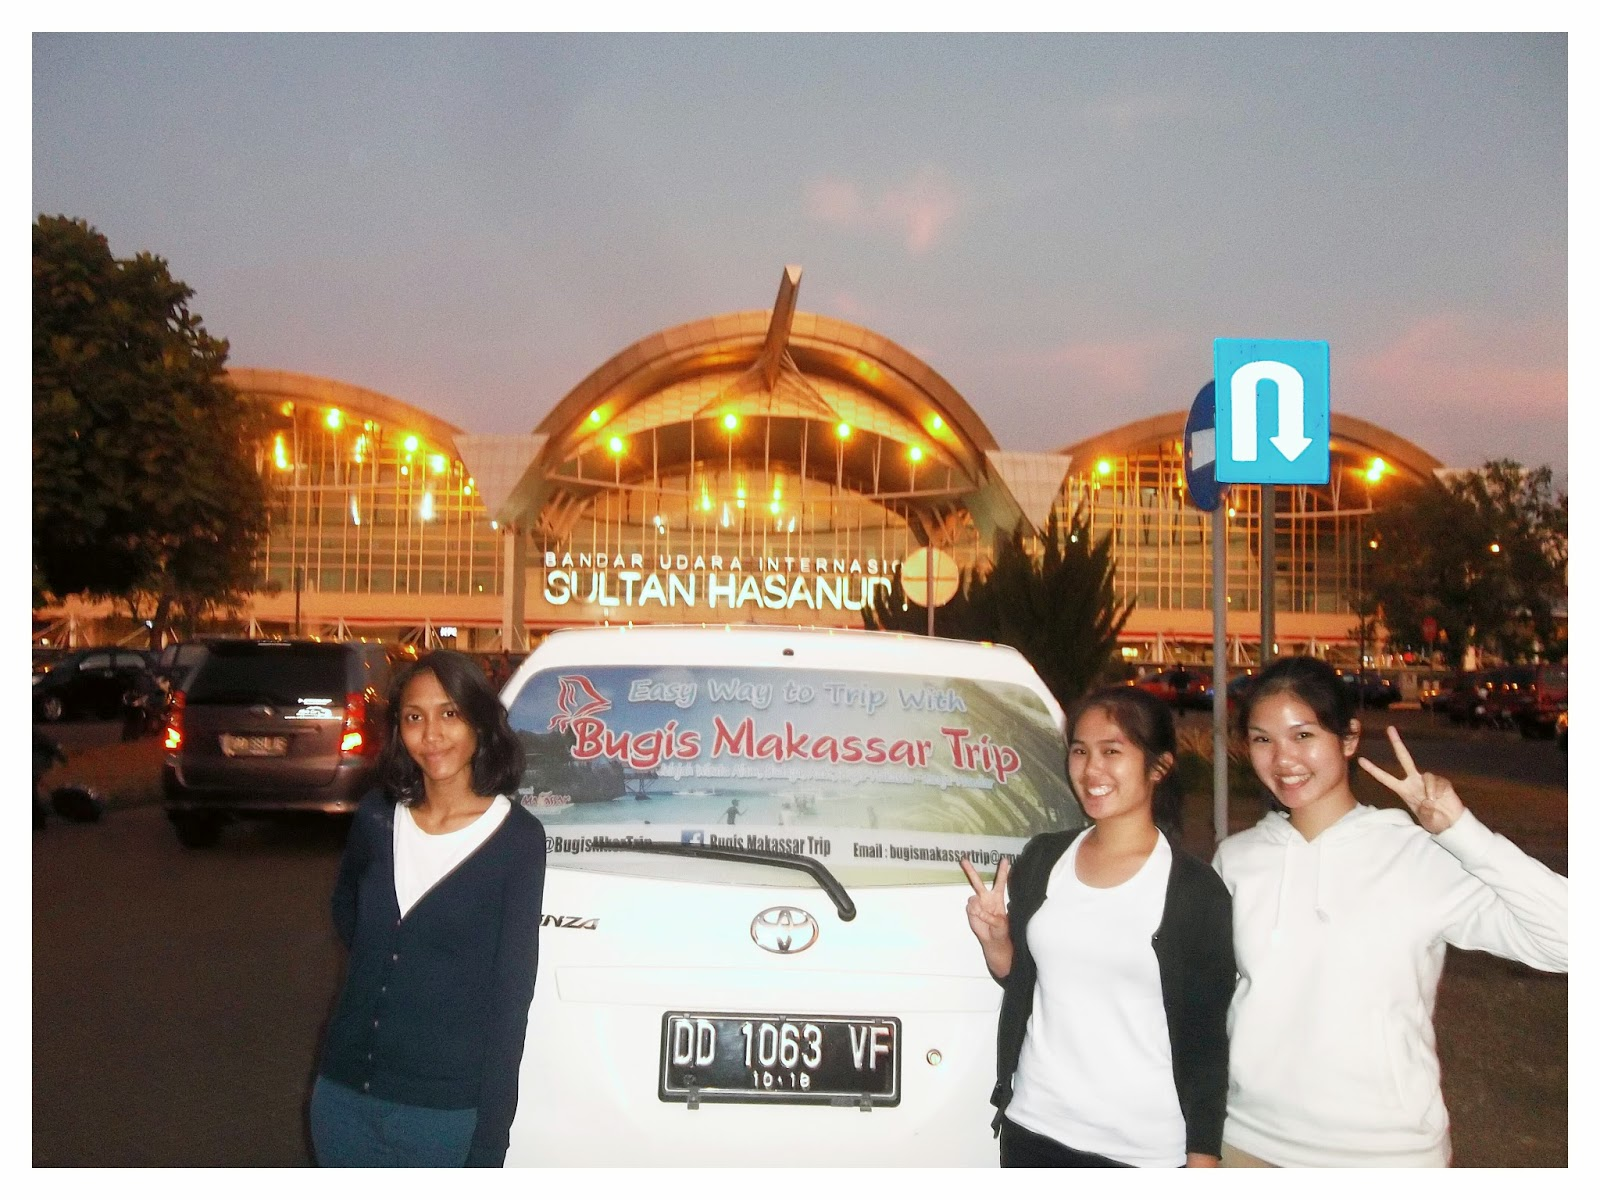 Bugis Makassar Trip